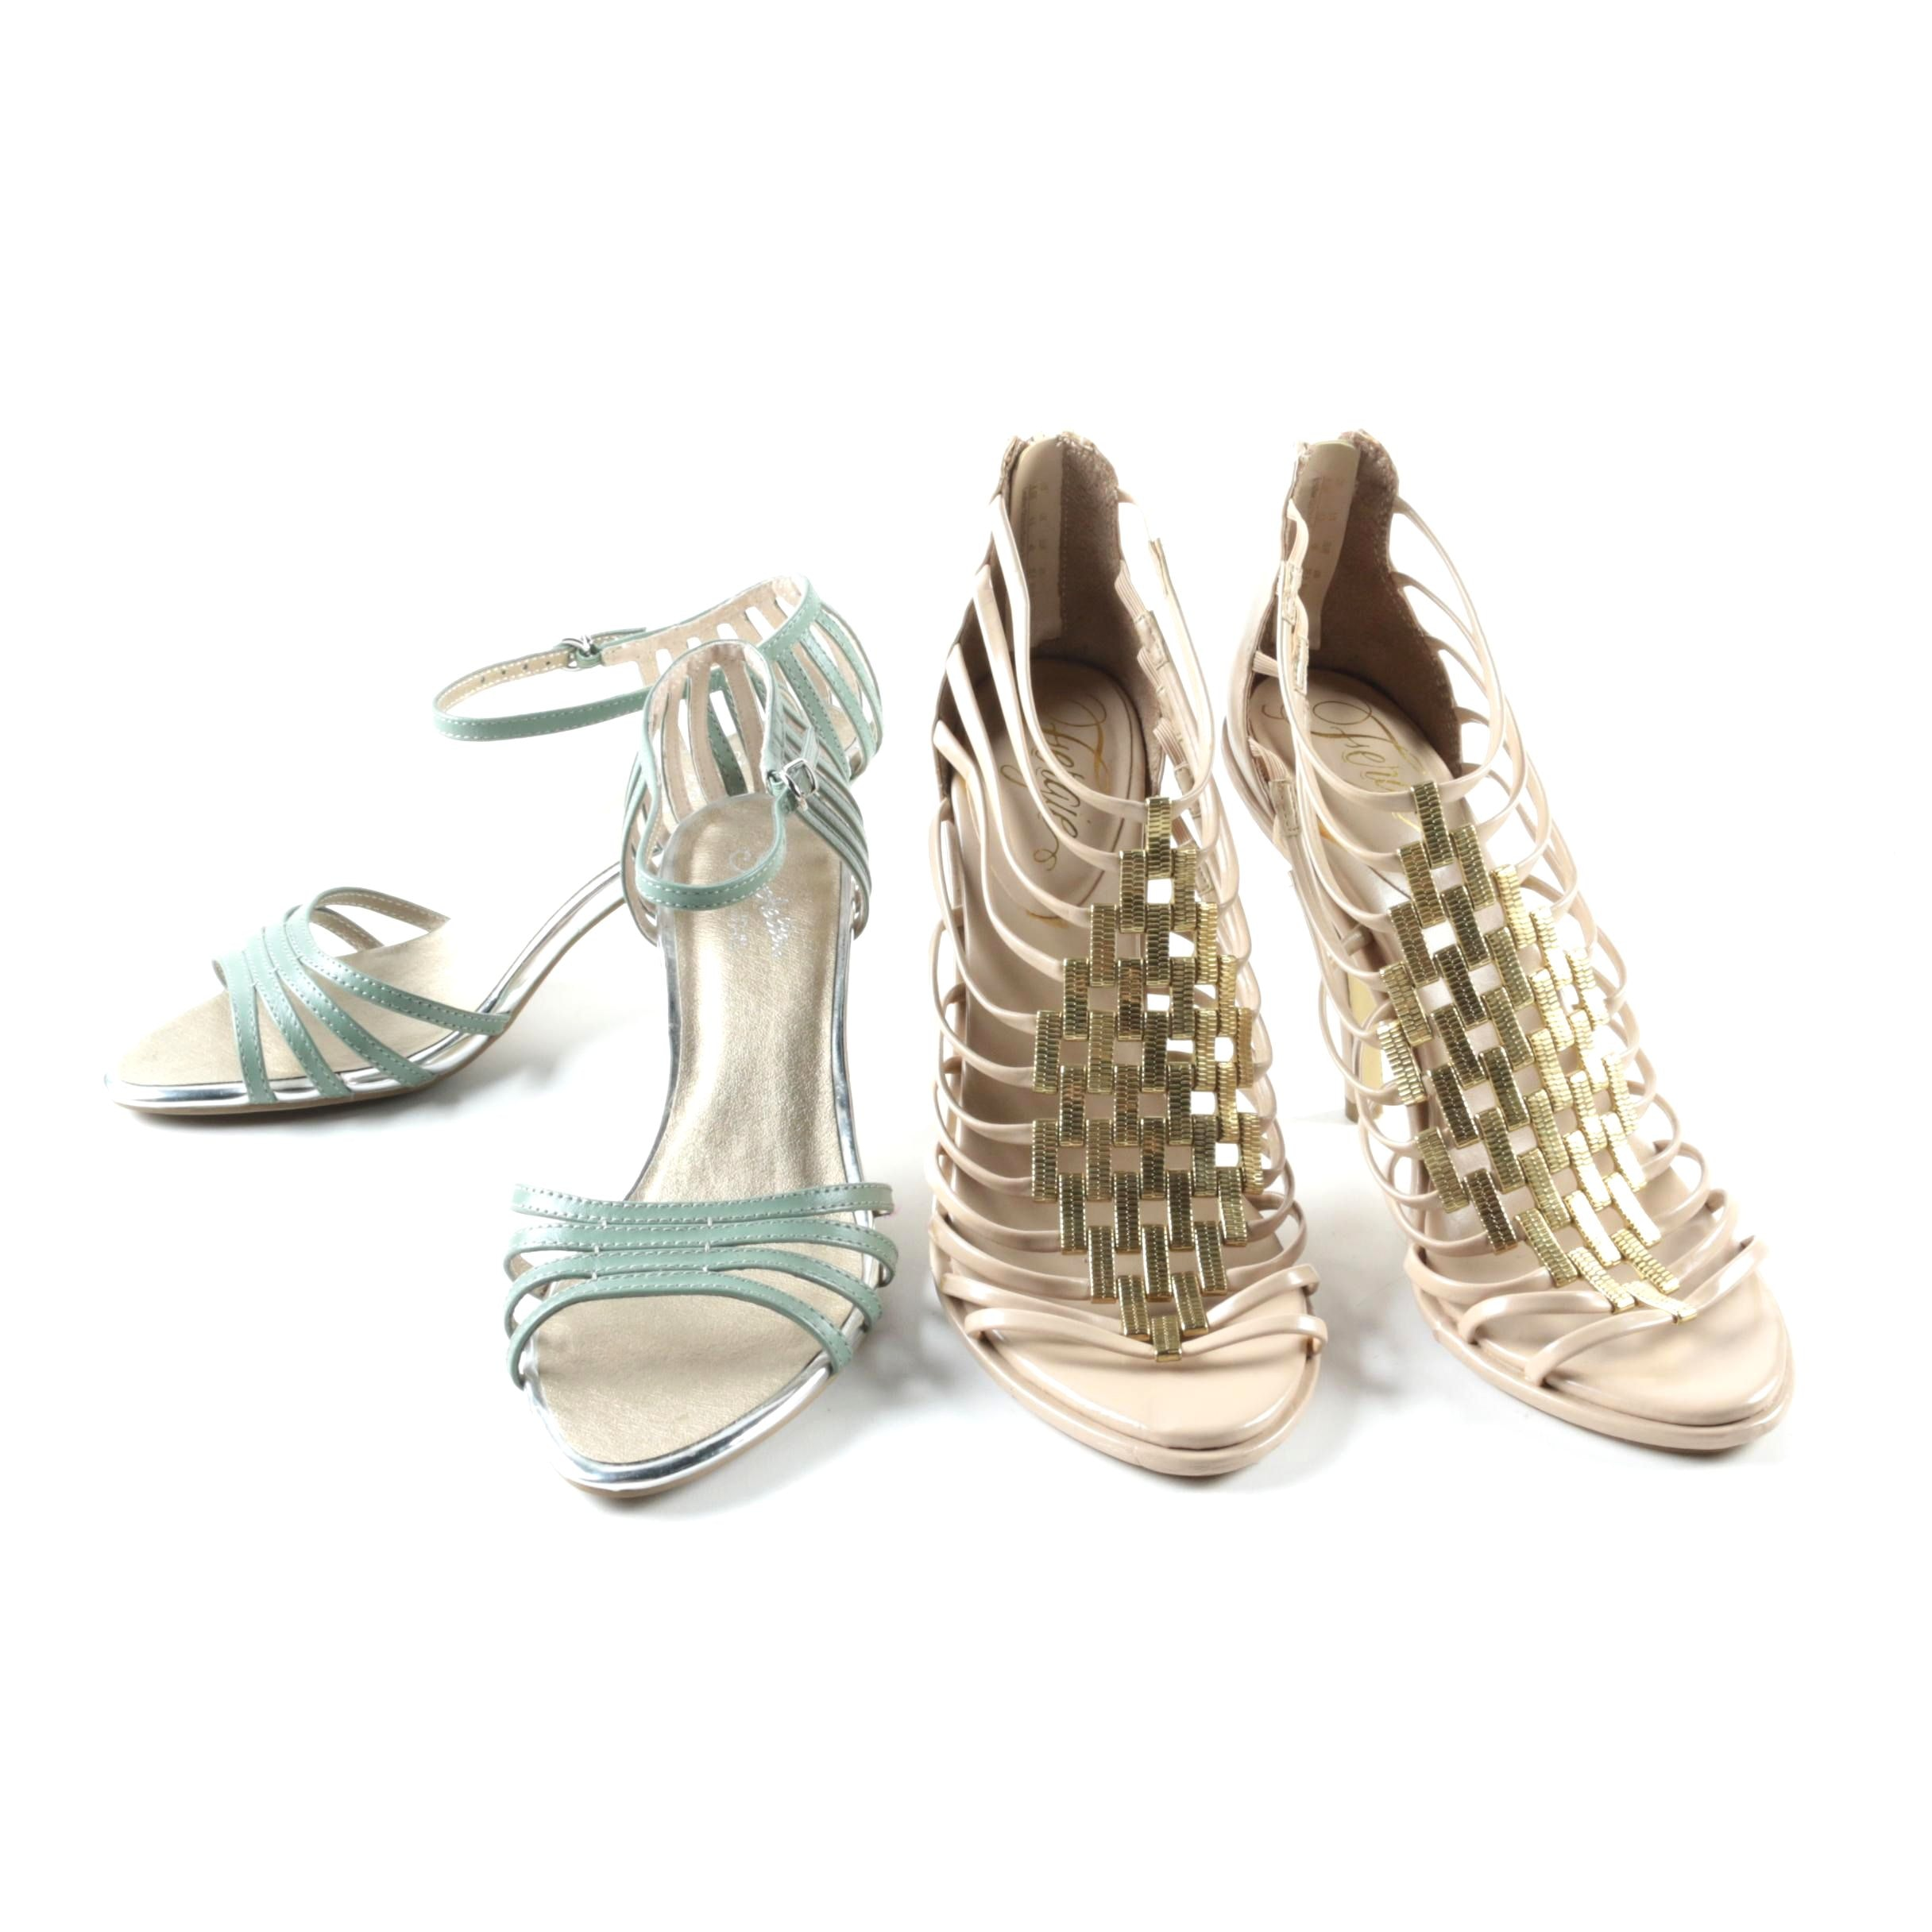 Women's Fergie and Seychelles High Heel Sandals